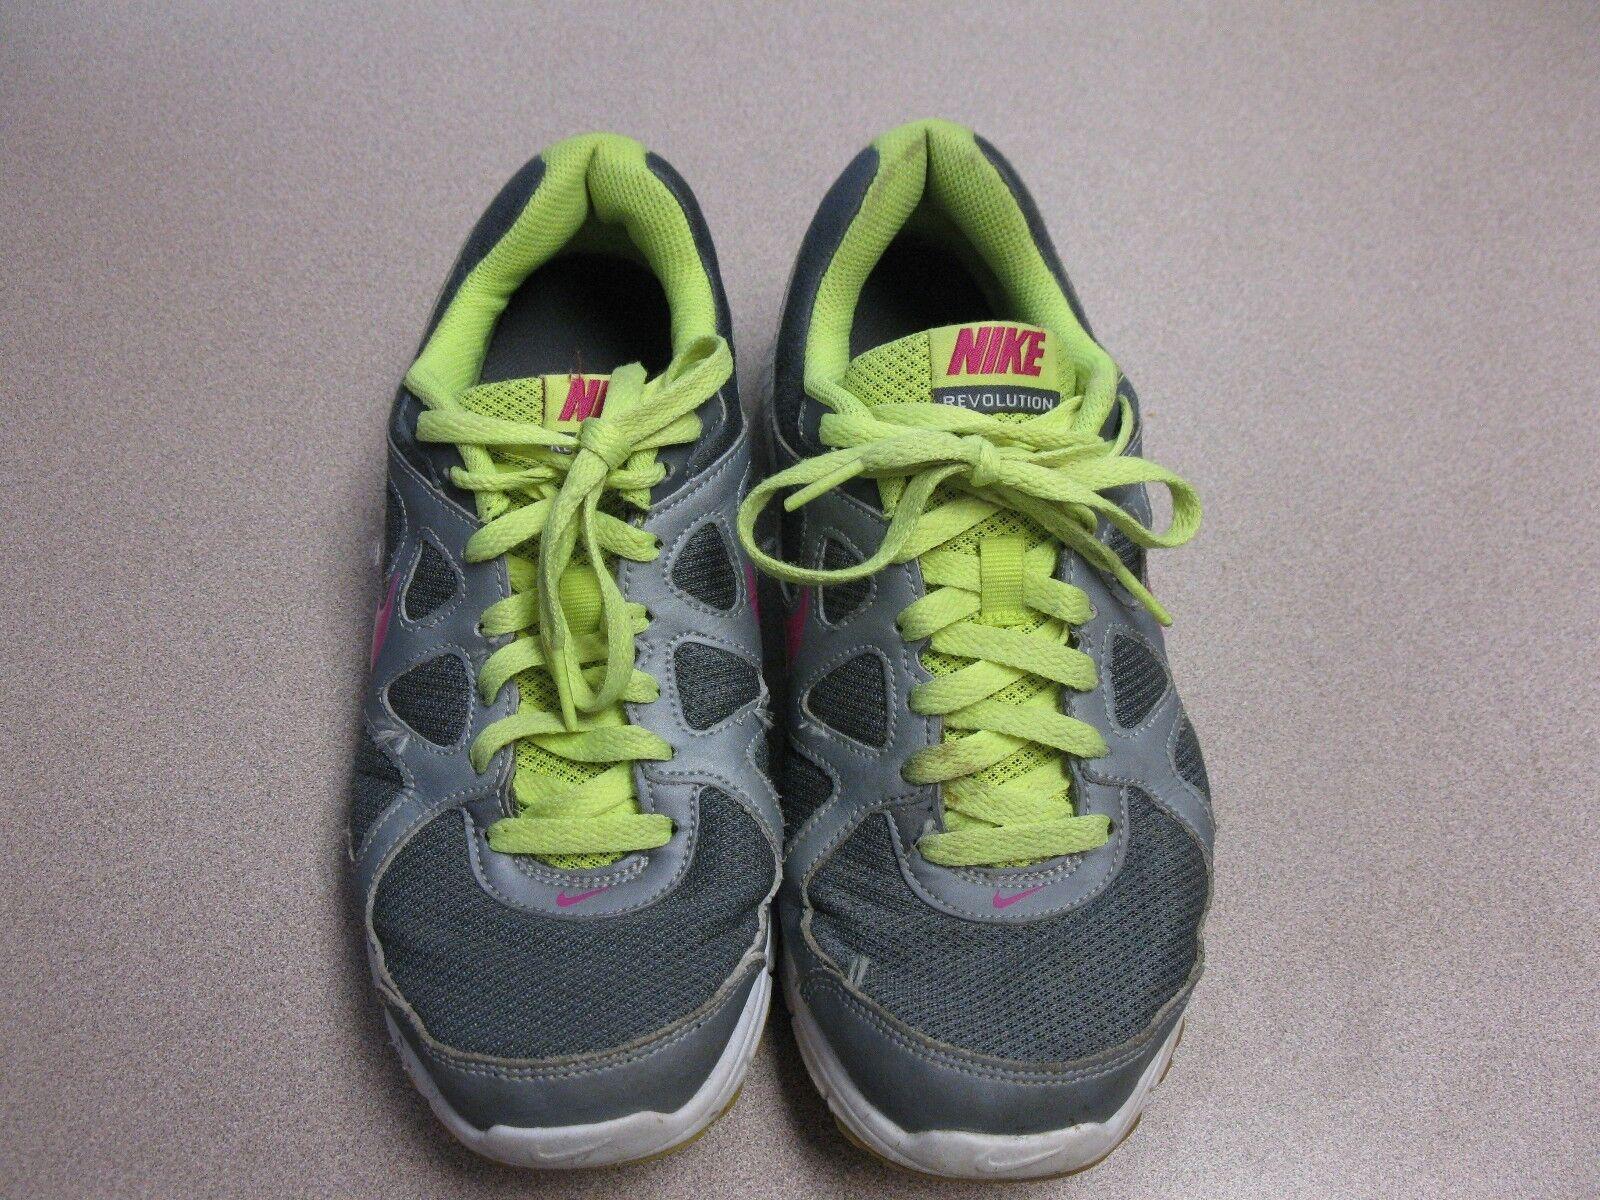 Women's Nike Revolution  Running Shoes, 488148-007 Comfortable Cheap and beautiful fashion